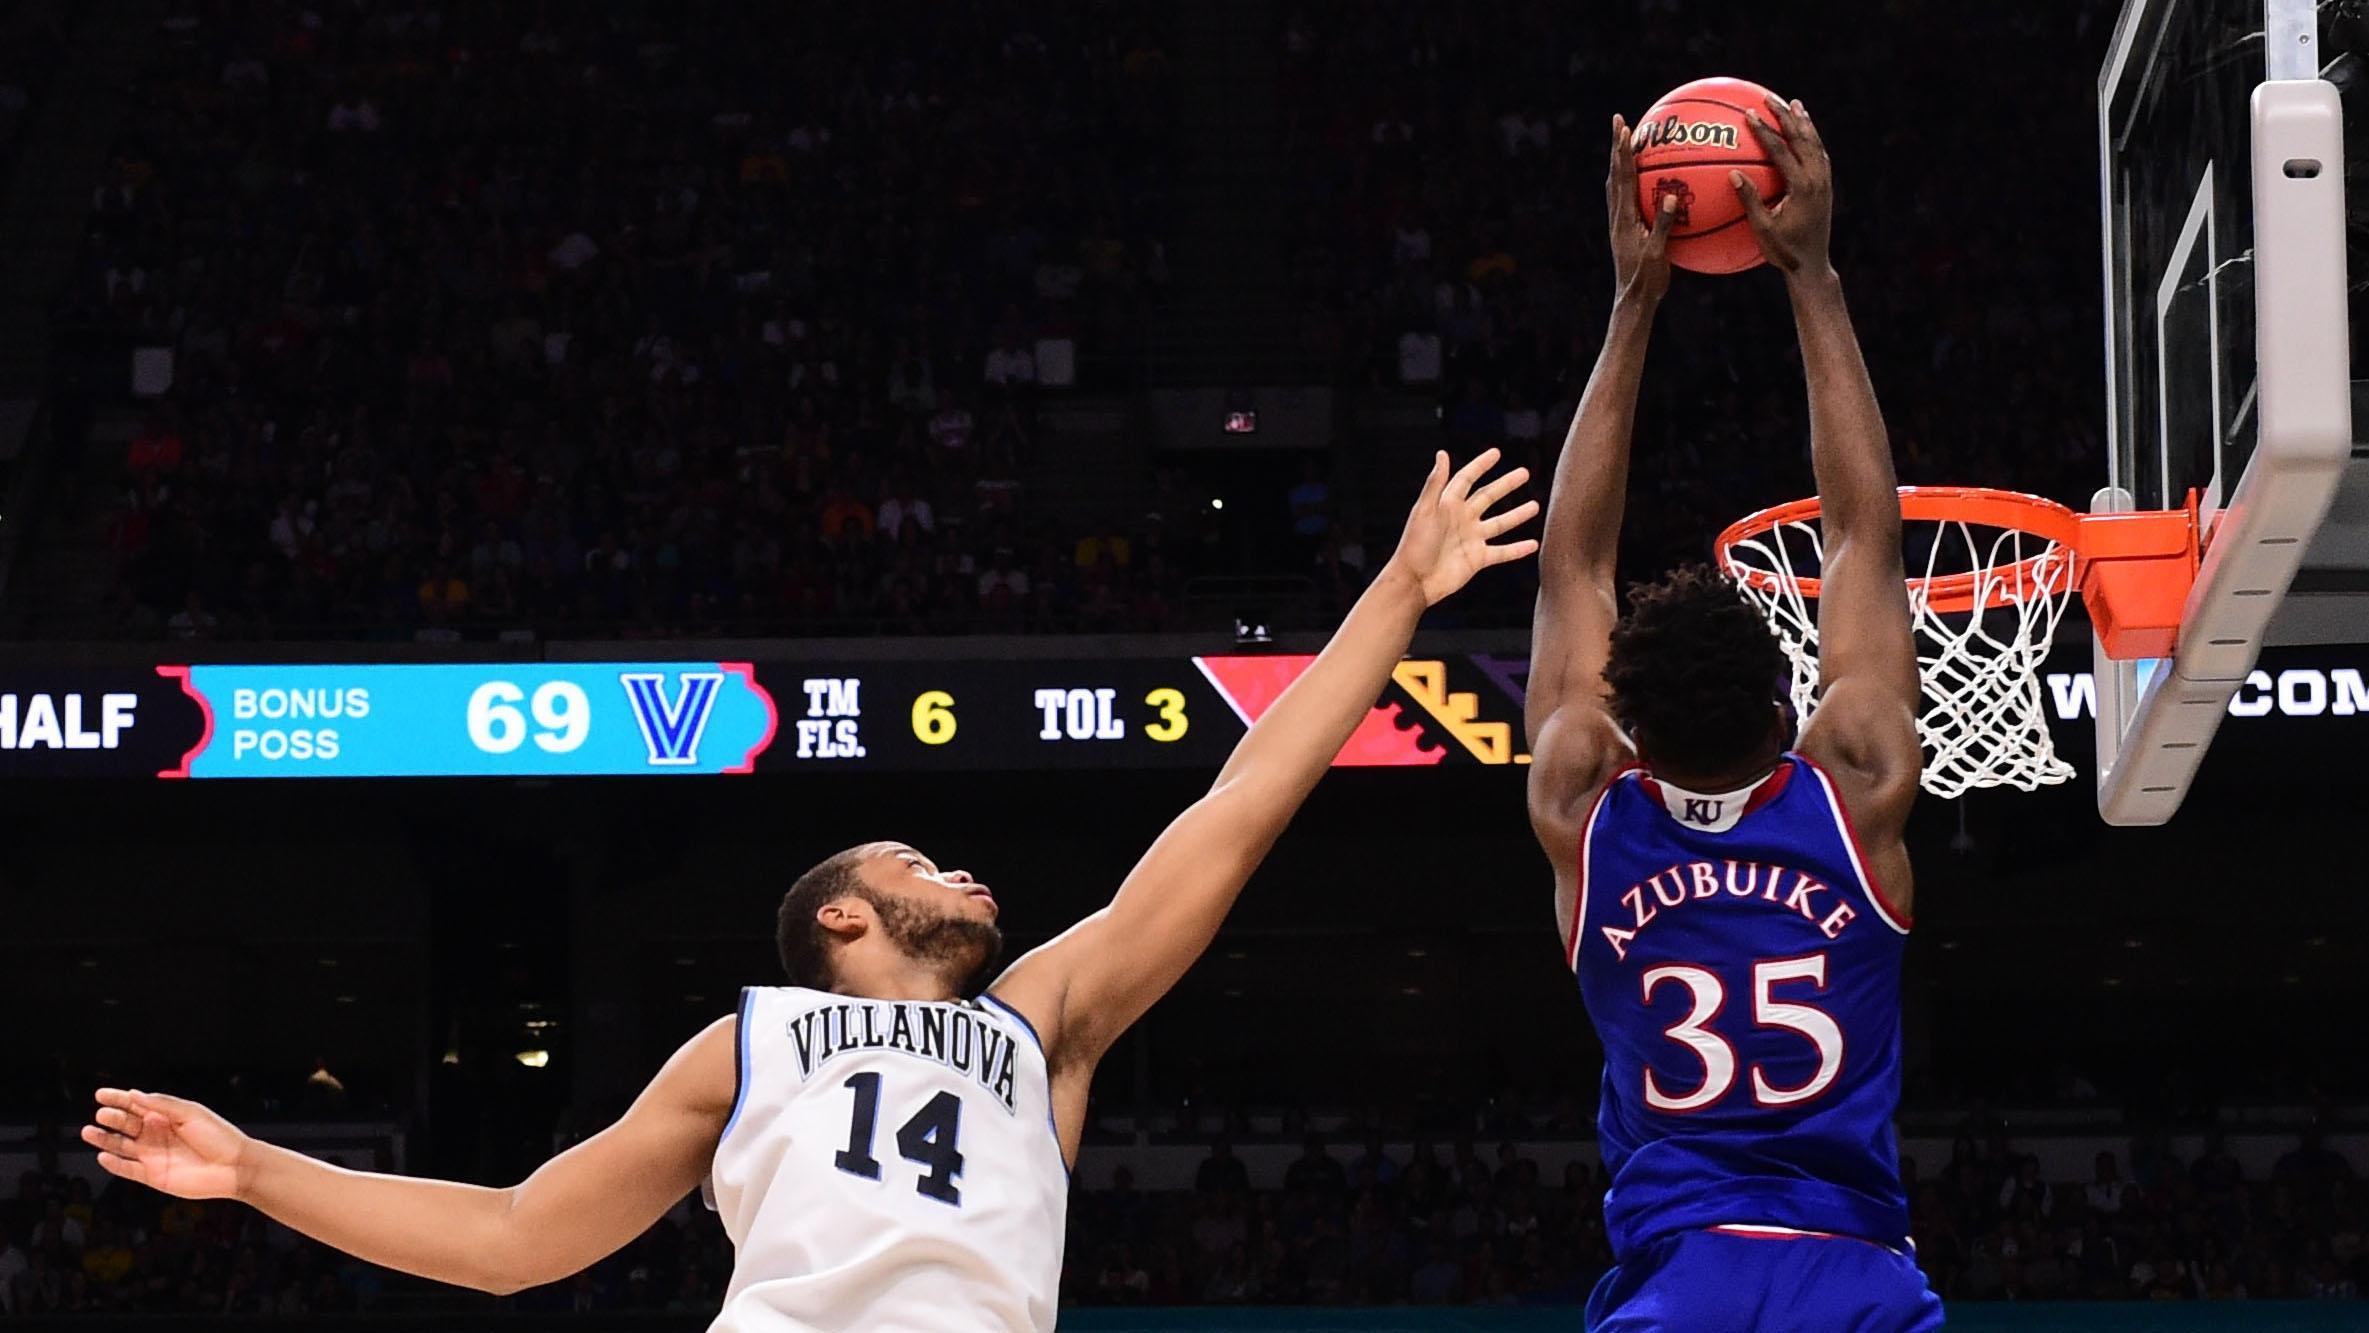 Kansas center Udoka Azubuike dunks against Villanova in the Final Four